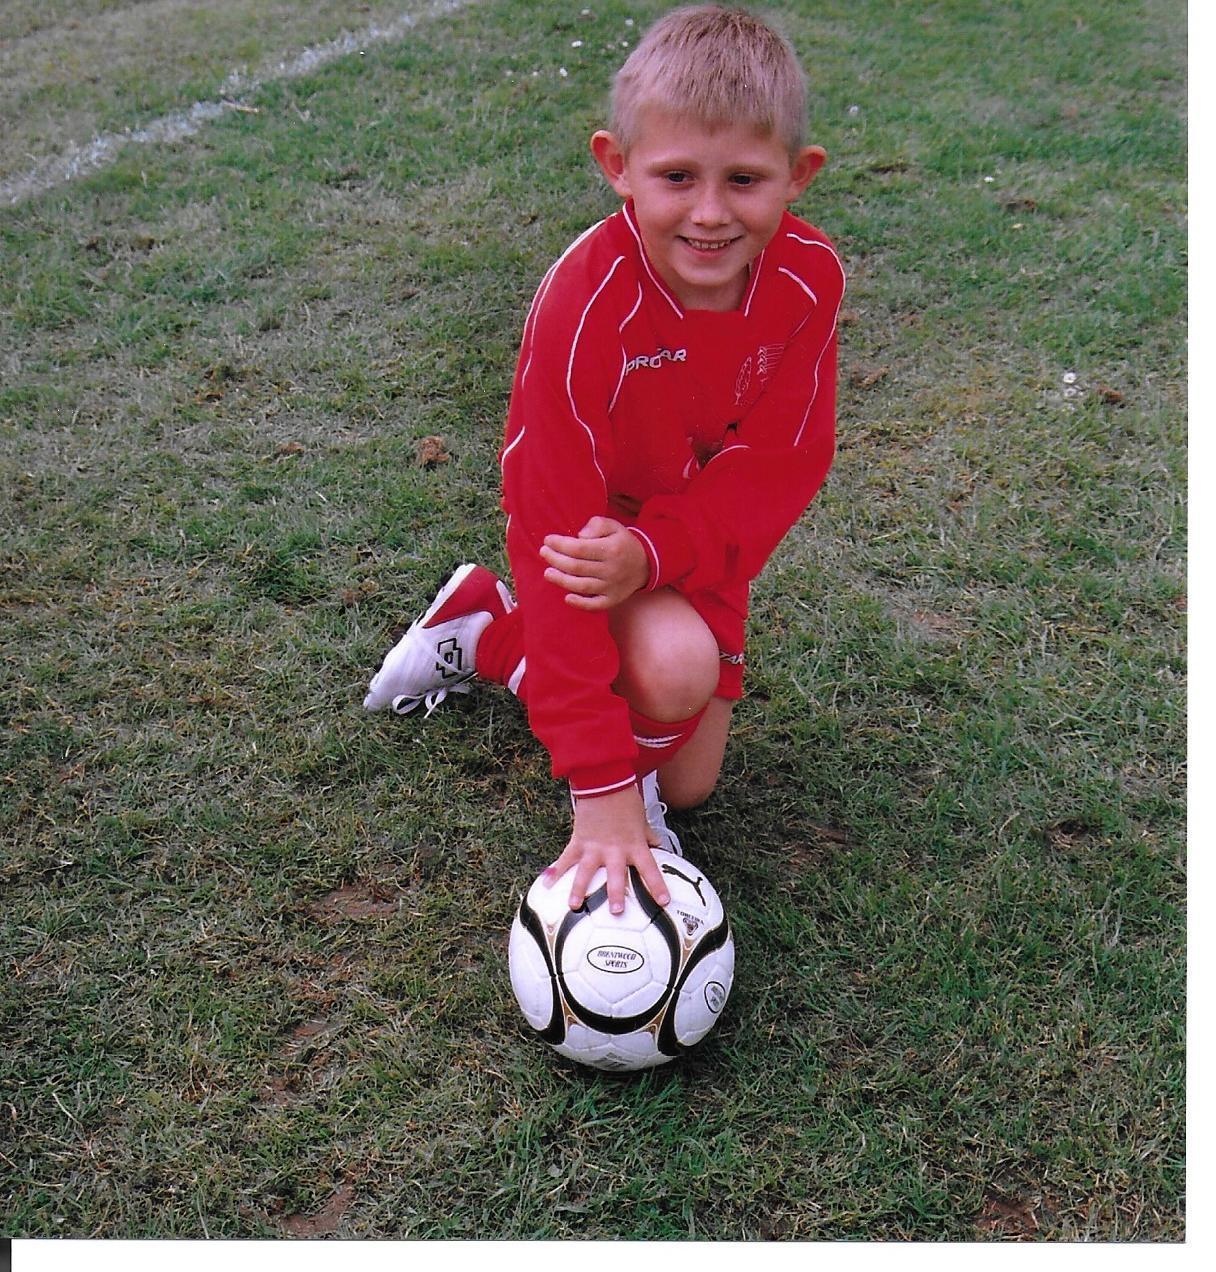 David age 7